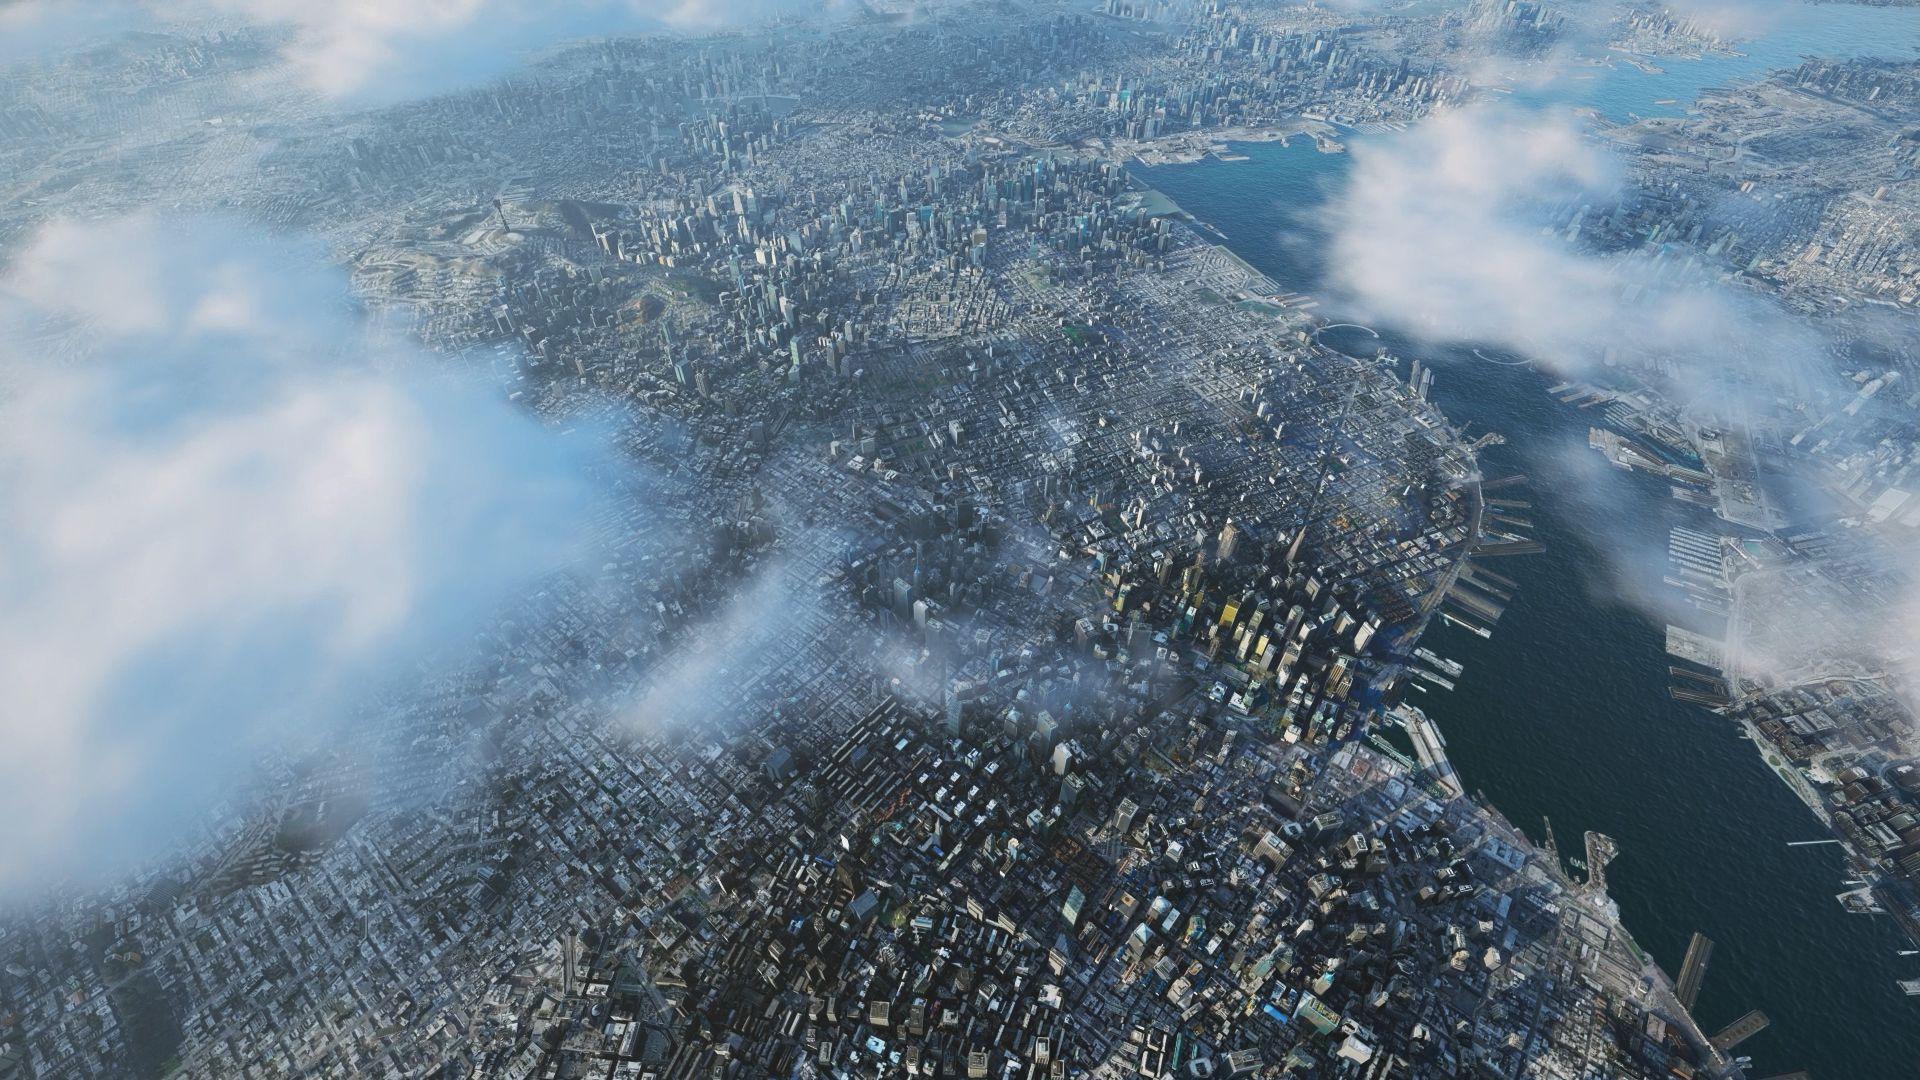 Bird's-eye view of Aedas City